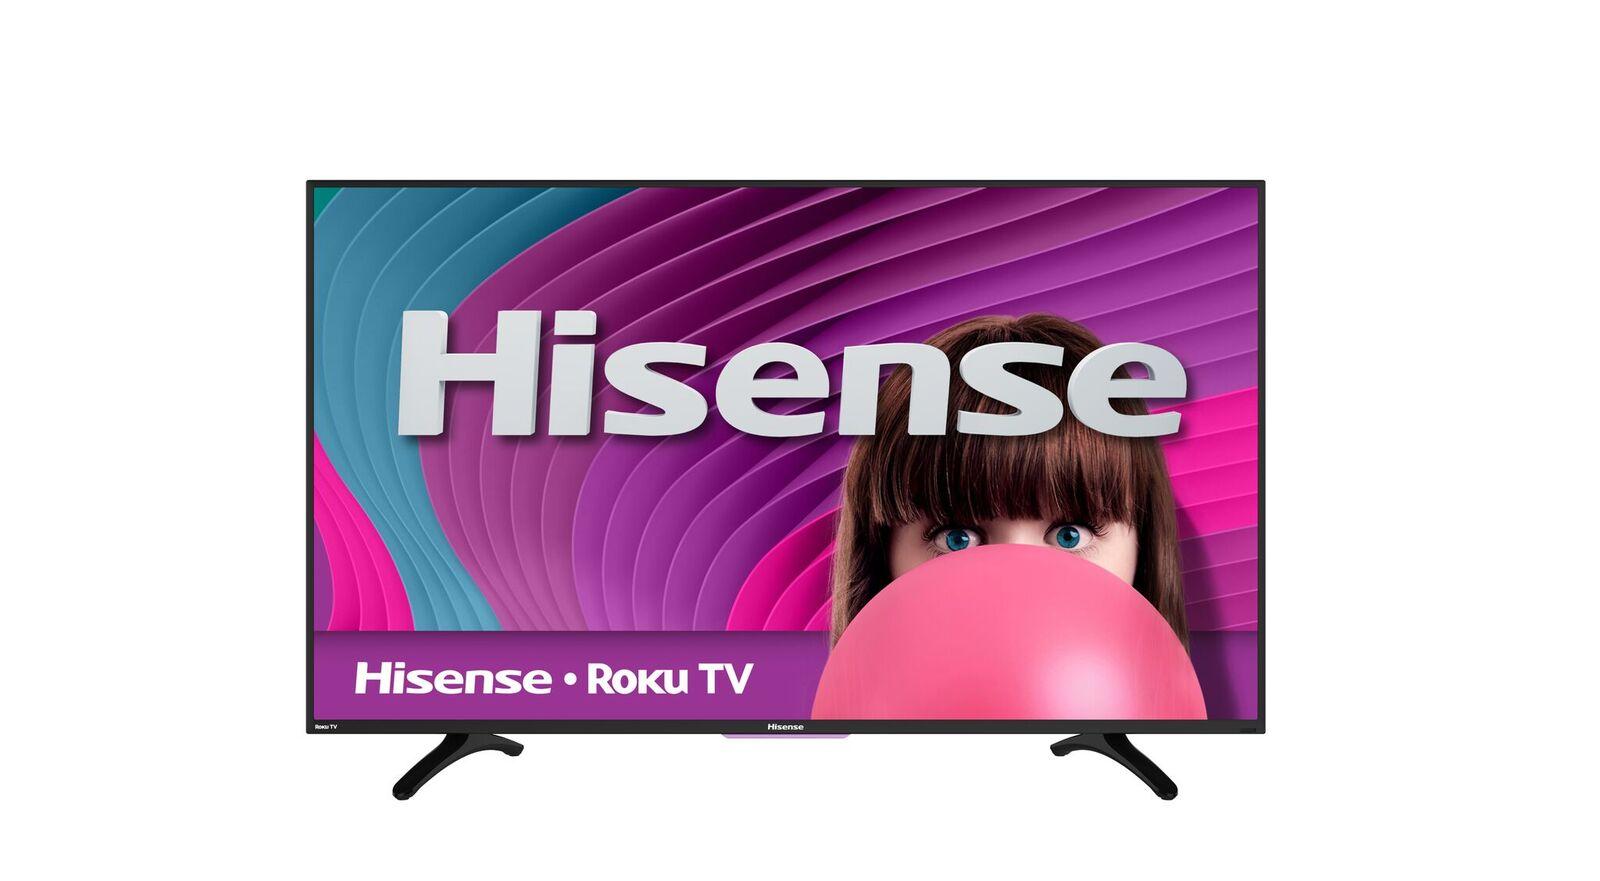 "Hisense 50H4C 50"" 1080p 60Hz LED Smart HDTV with Roku by Hisense"